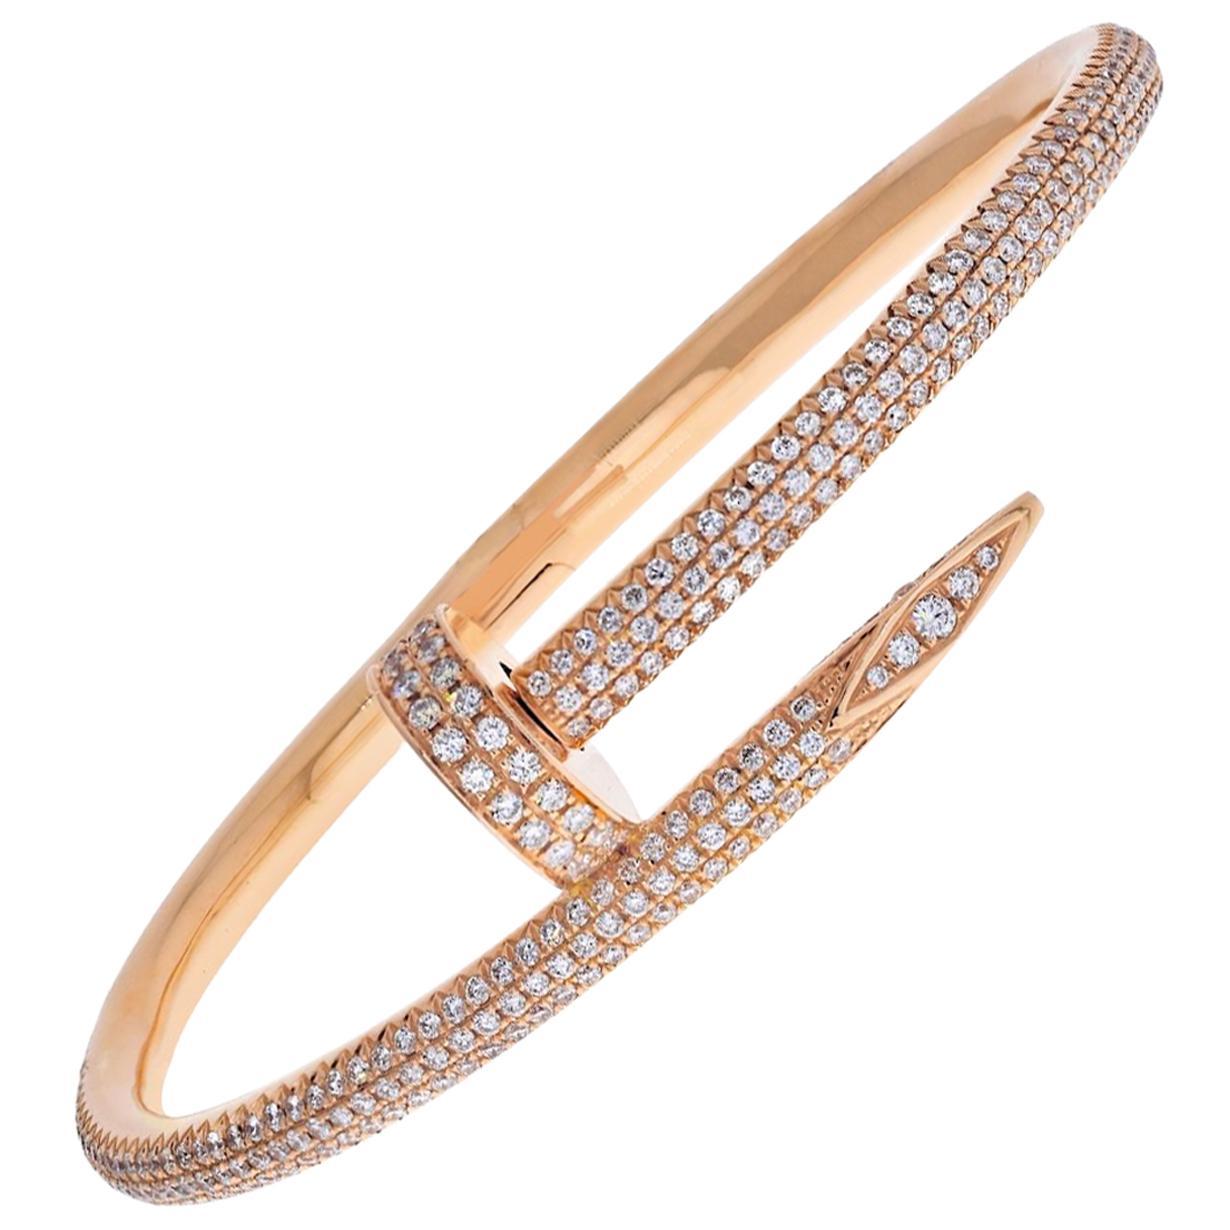 Cartier Juste Un Clou 18 Karat Rose Gold Bracelet